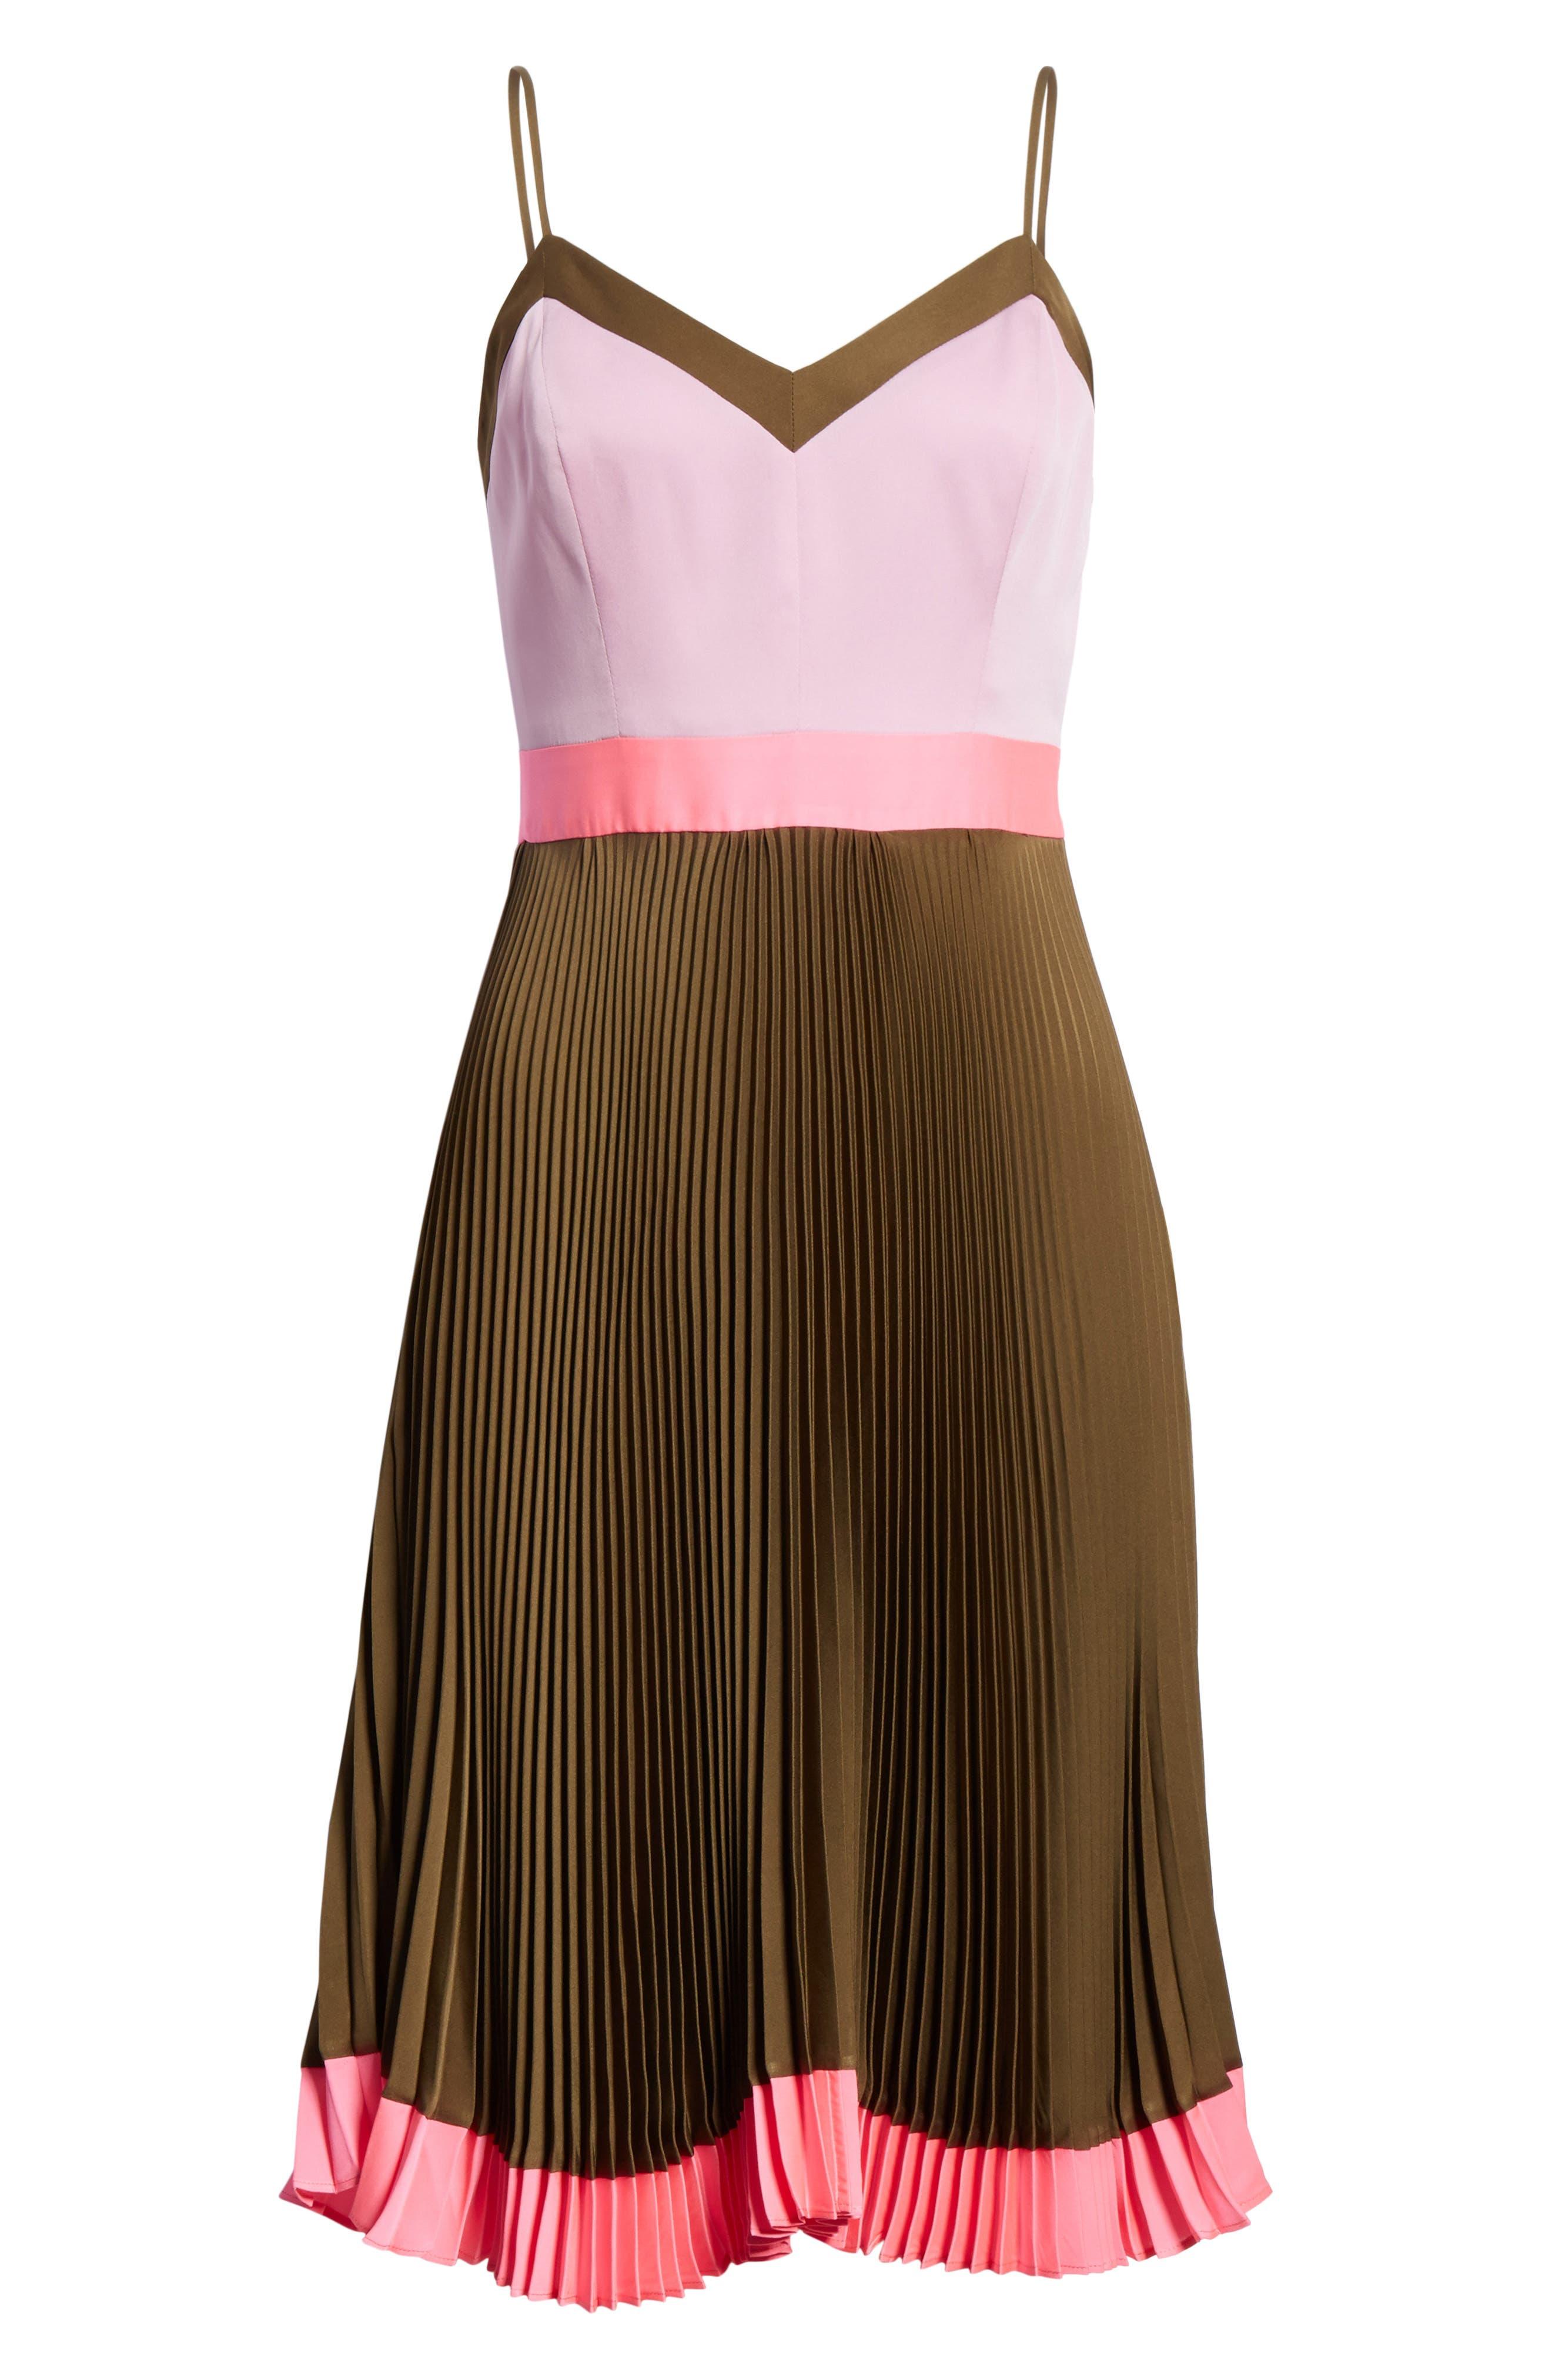 Jill Pleated Stretch Silk Dress,                             Alternate thumbnail 6, color,                             Olive/ Petal/ Fluo Pink